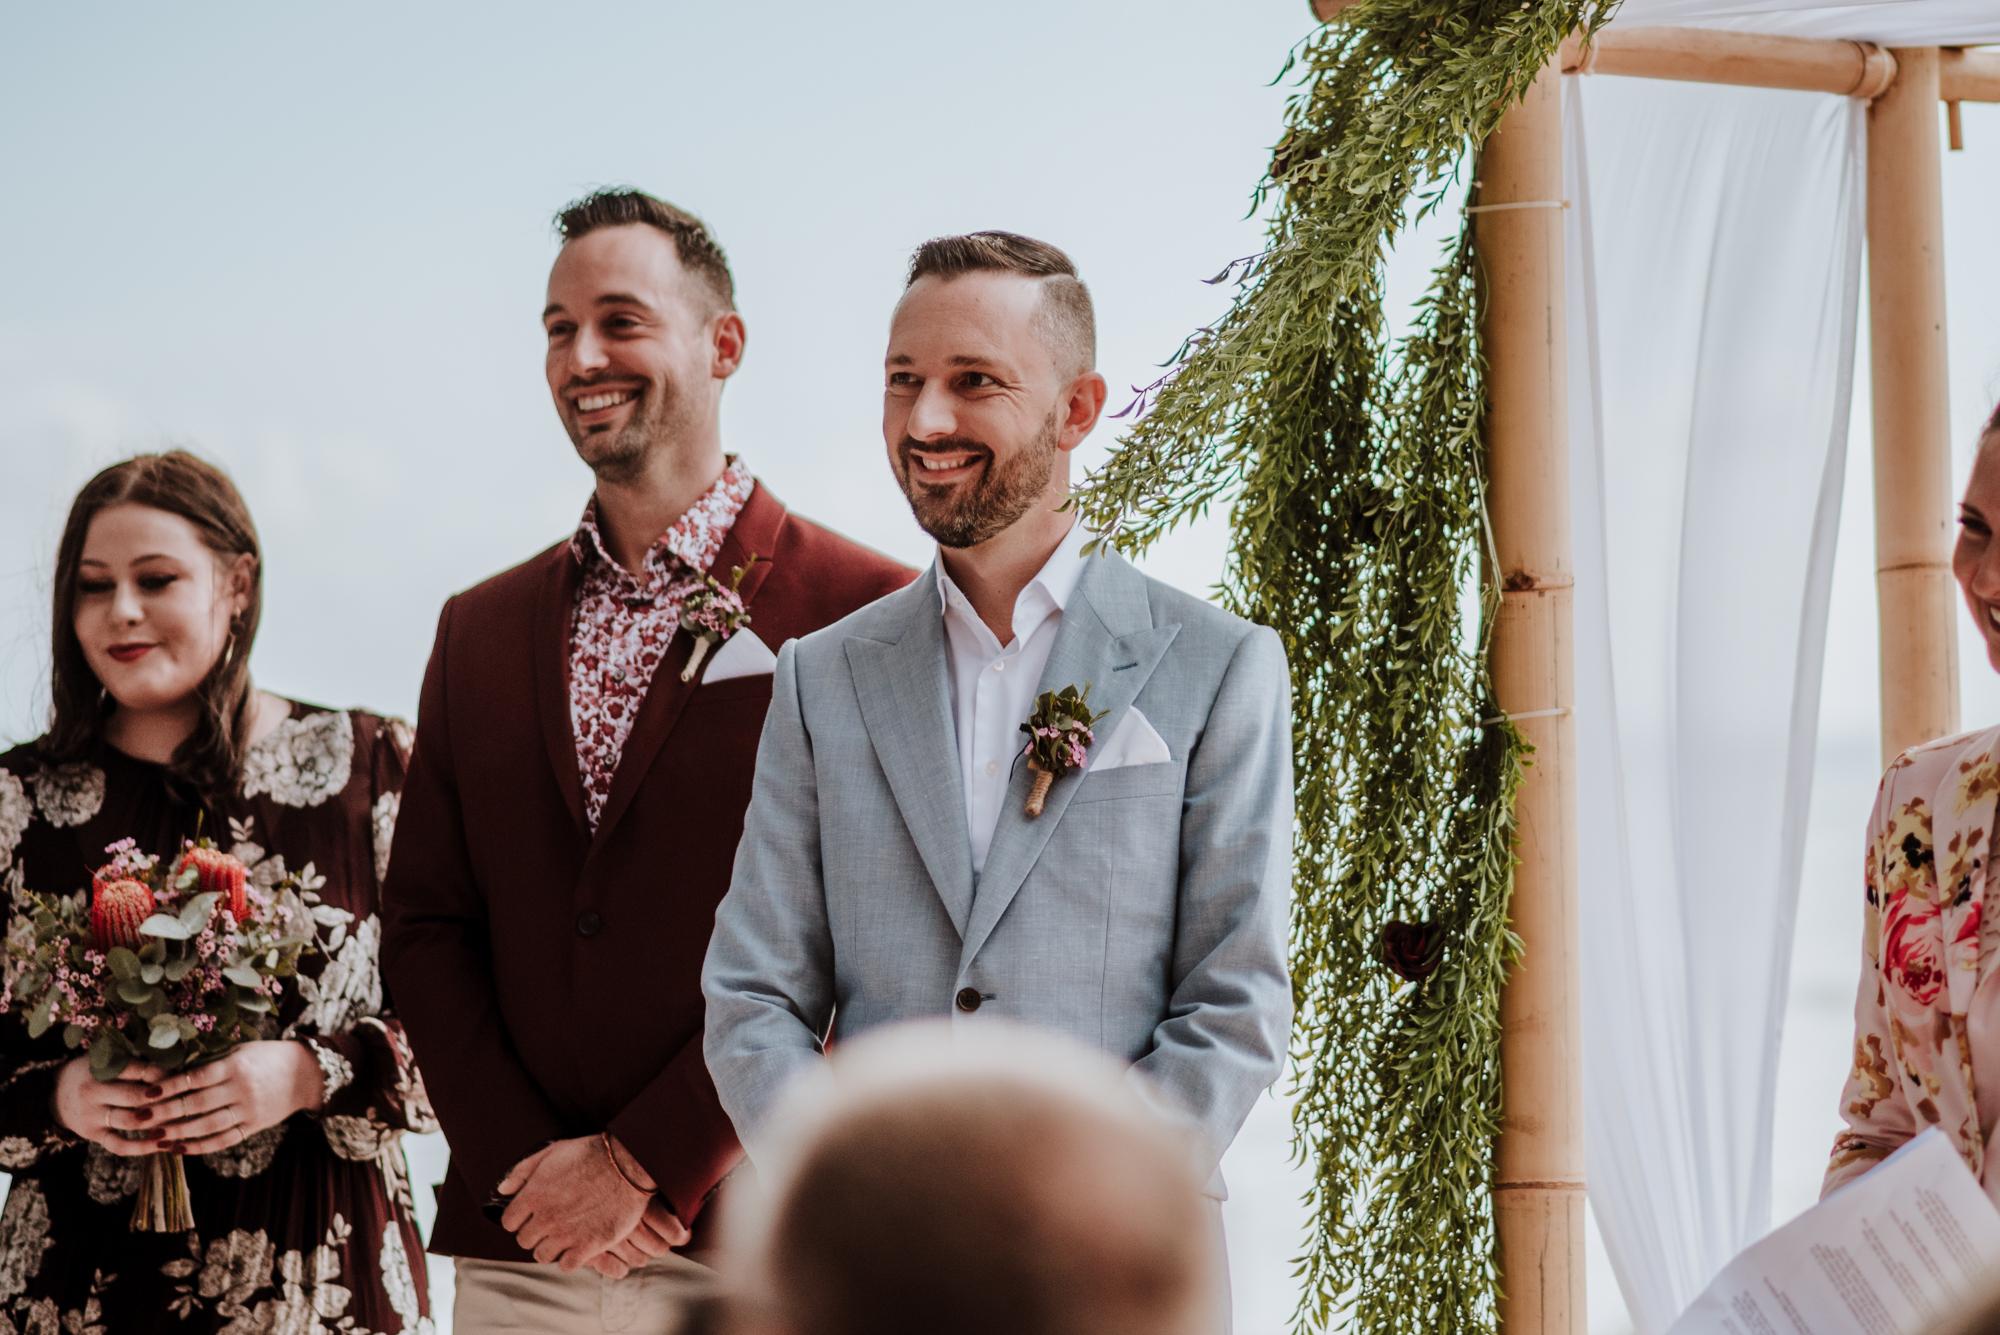 jessica-howard-photography-sean-alessandro-wedding-day-web-234.jpg